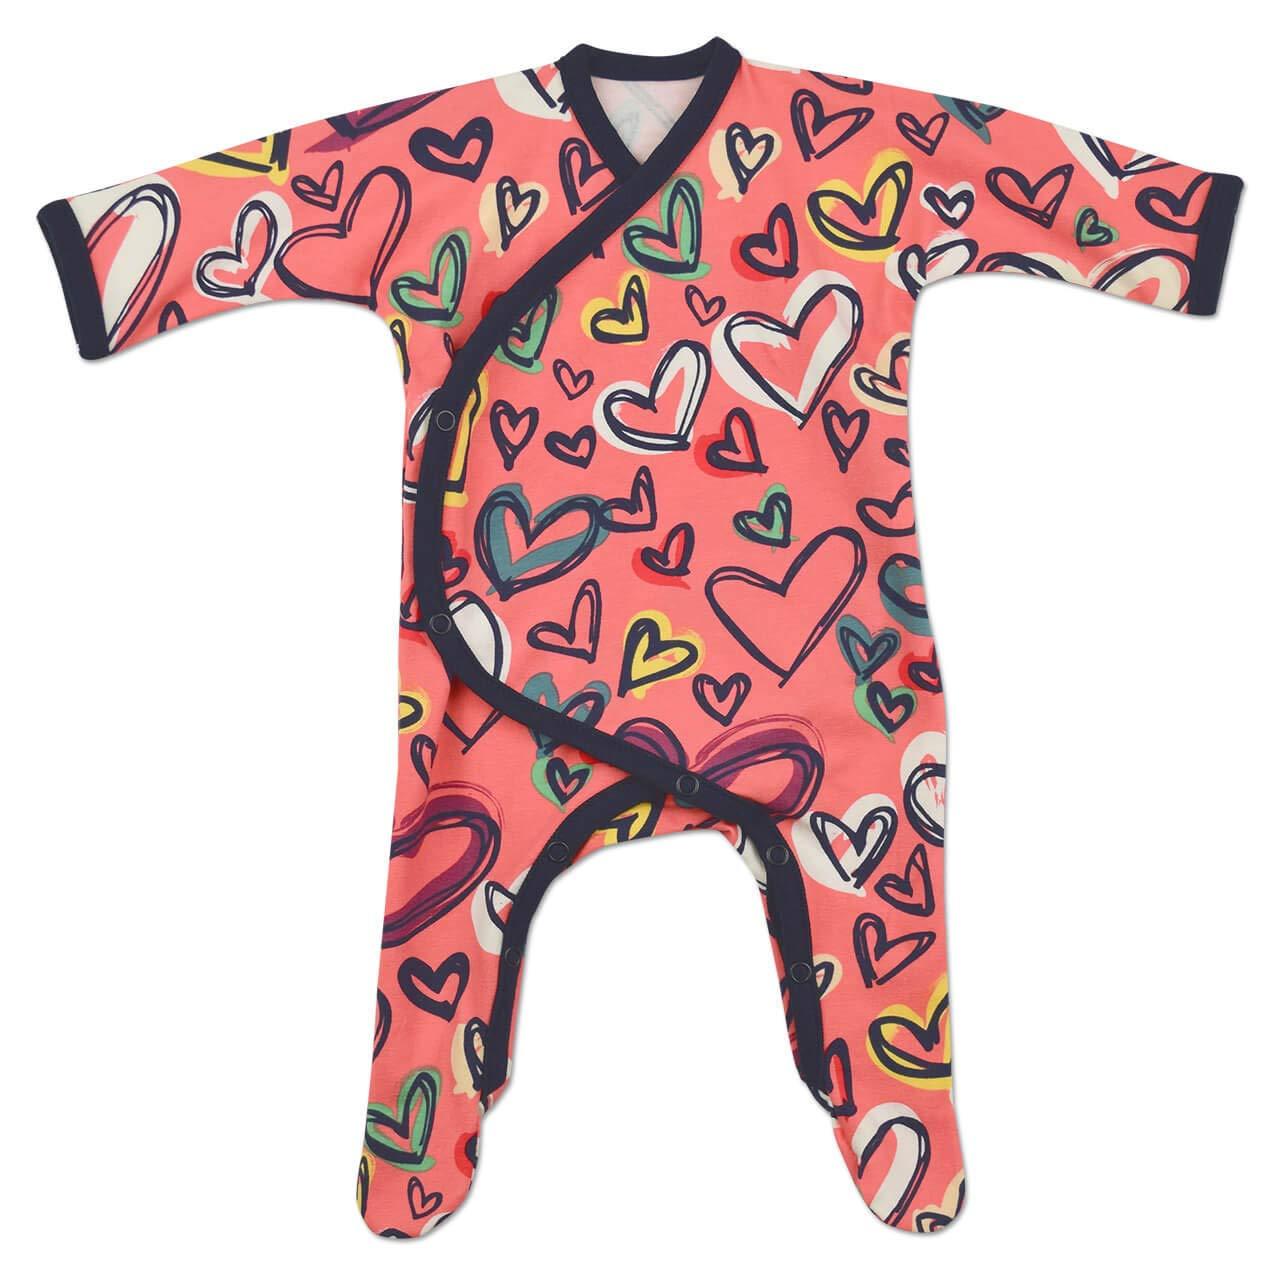 Perfectly Preemie Boys /& Girls Playsuit